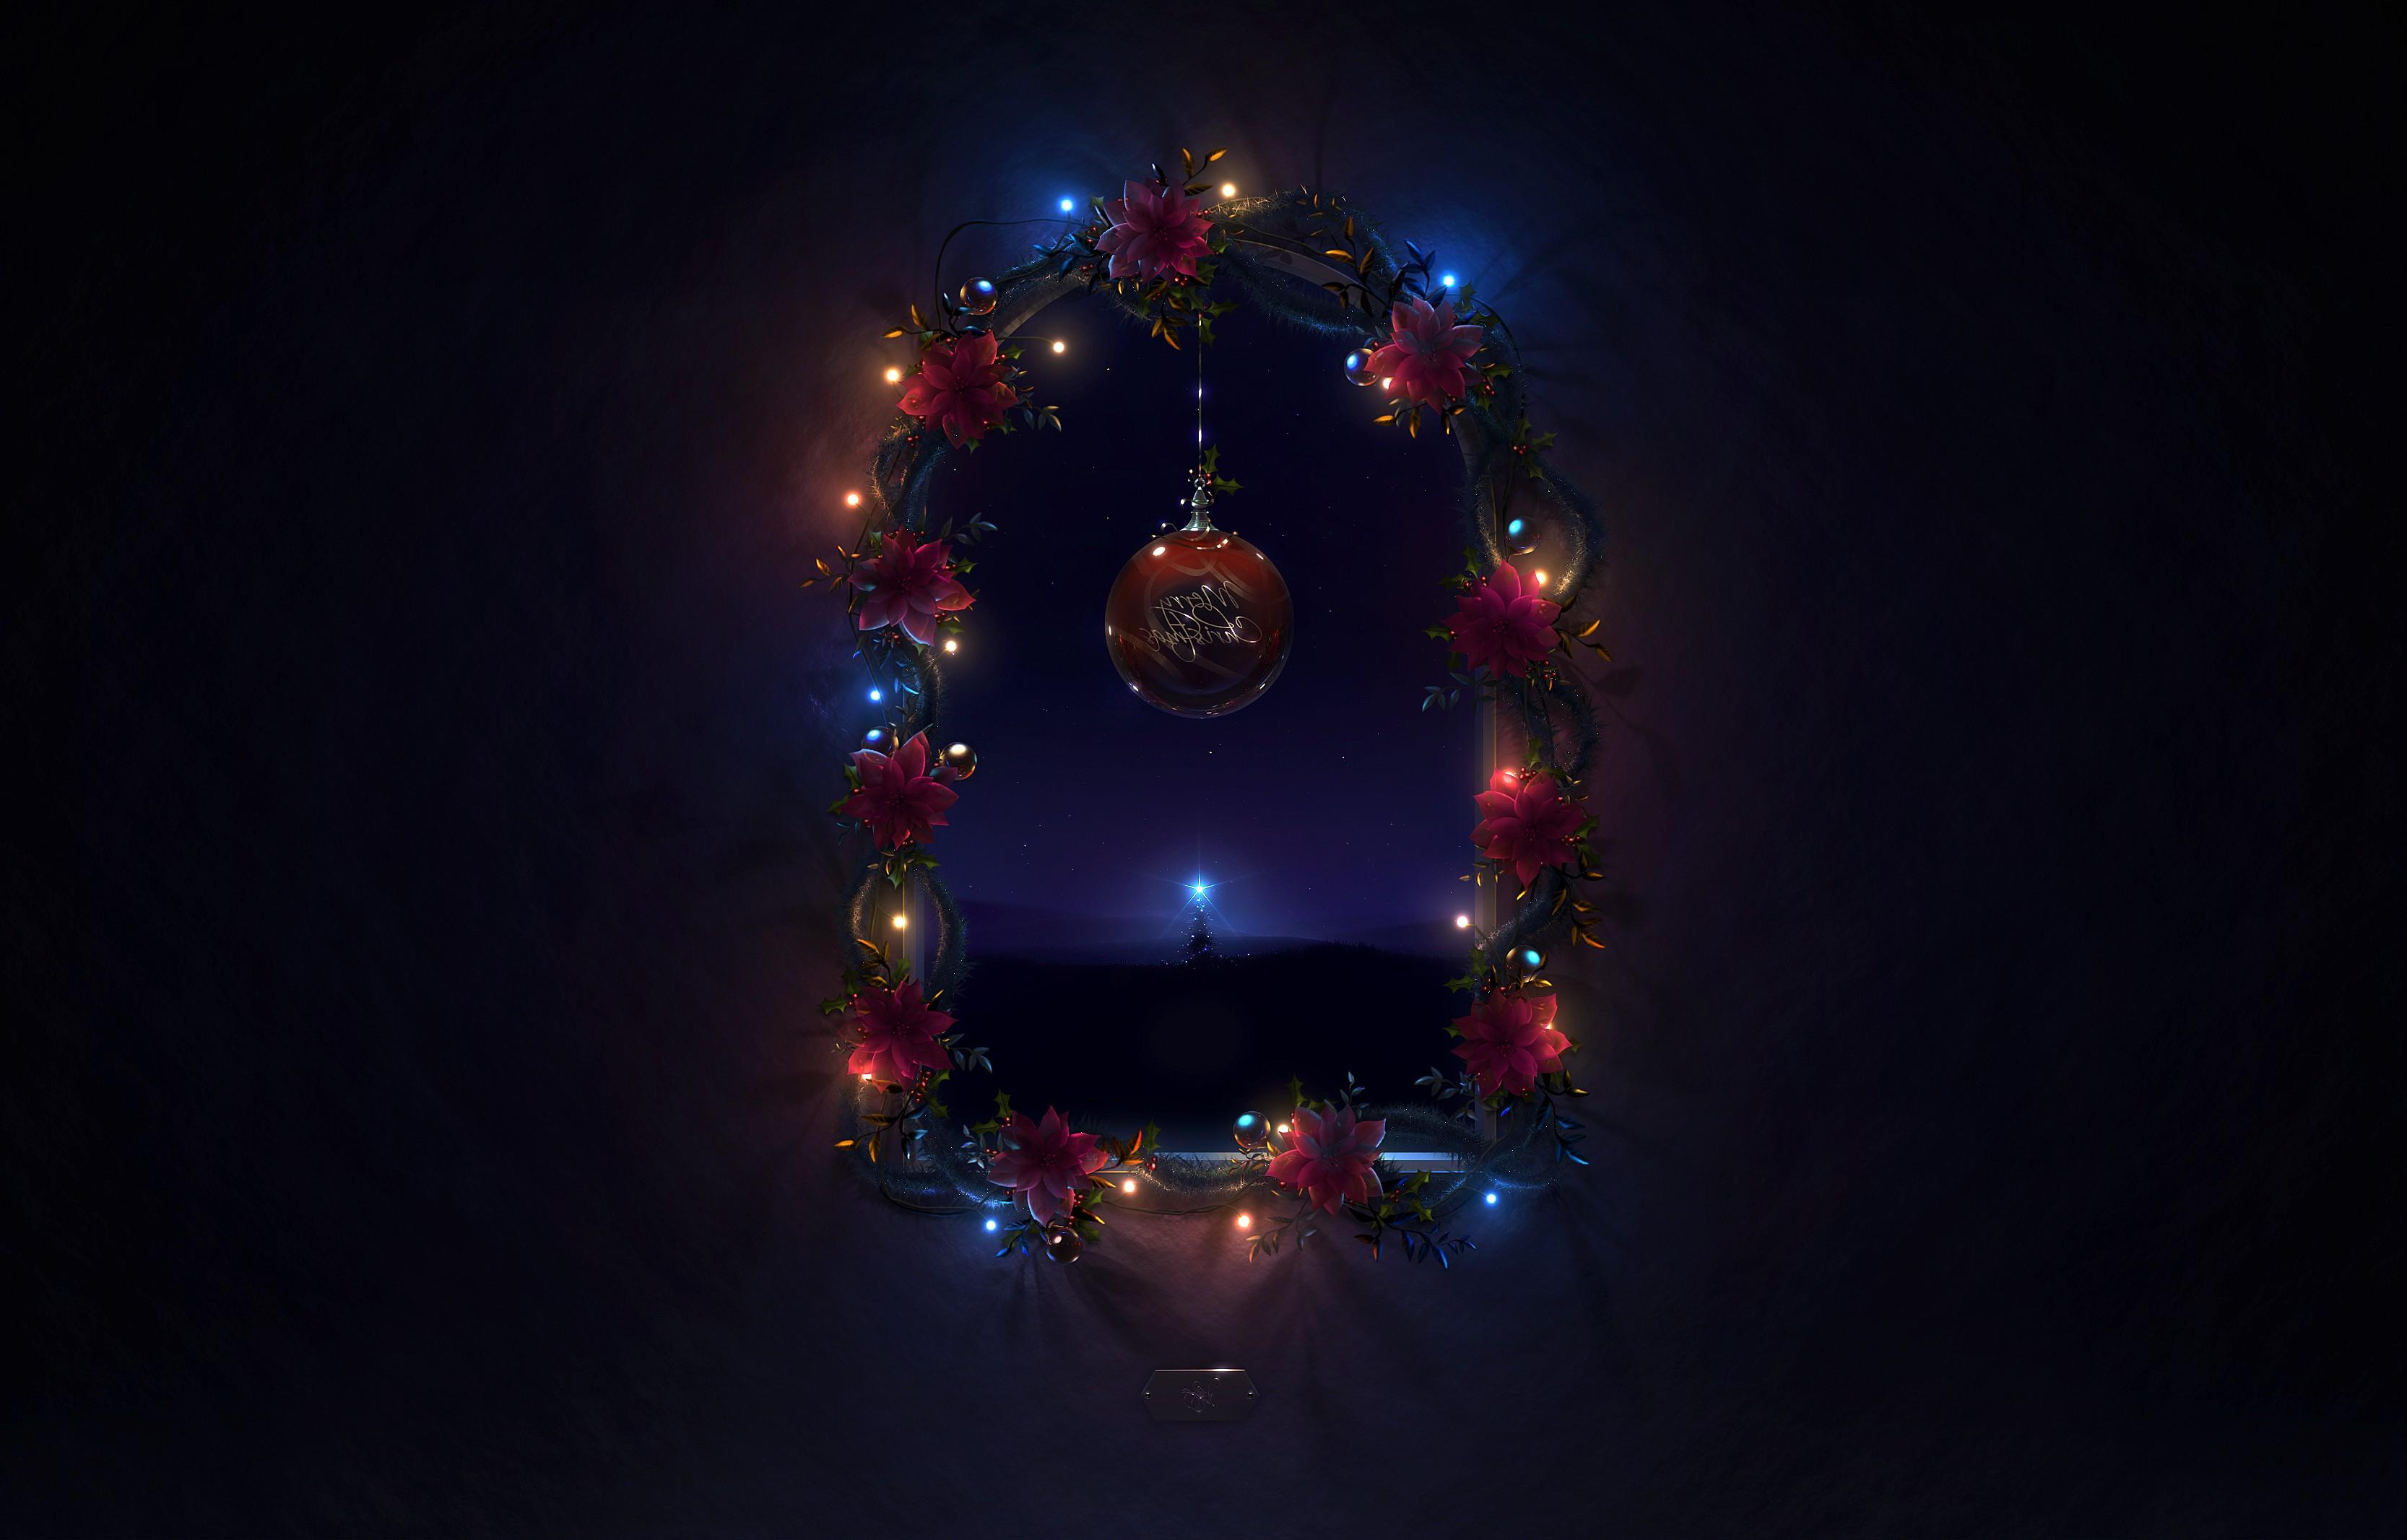 Wallpaper Night Christmas Tree Christmas Lights Event